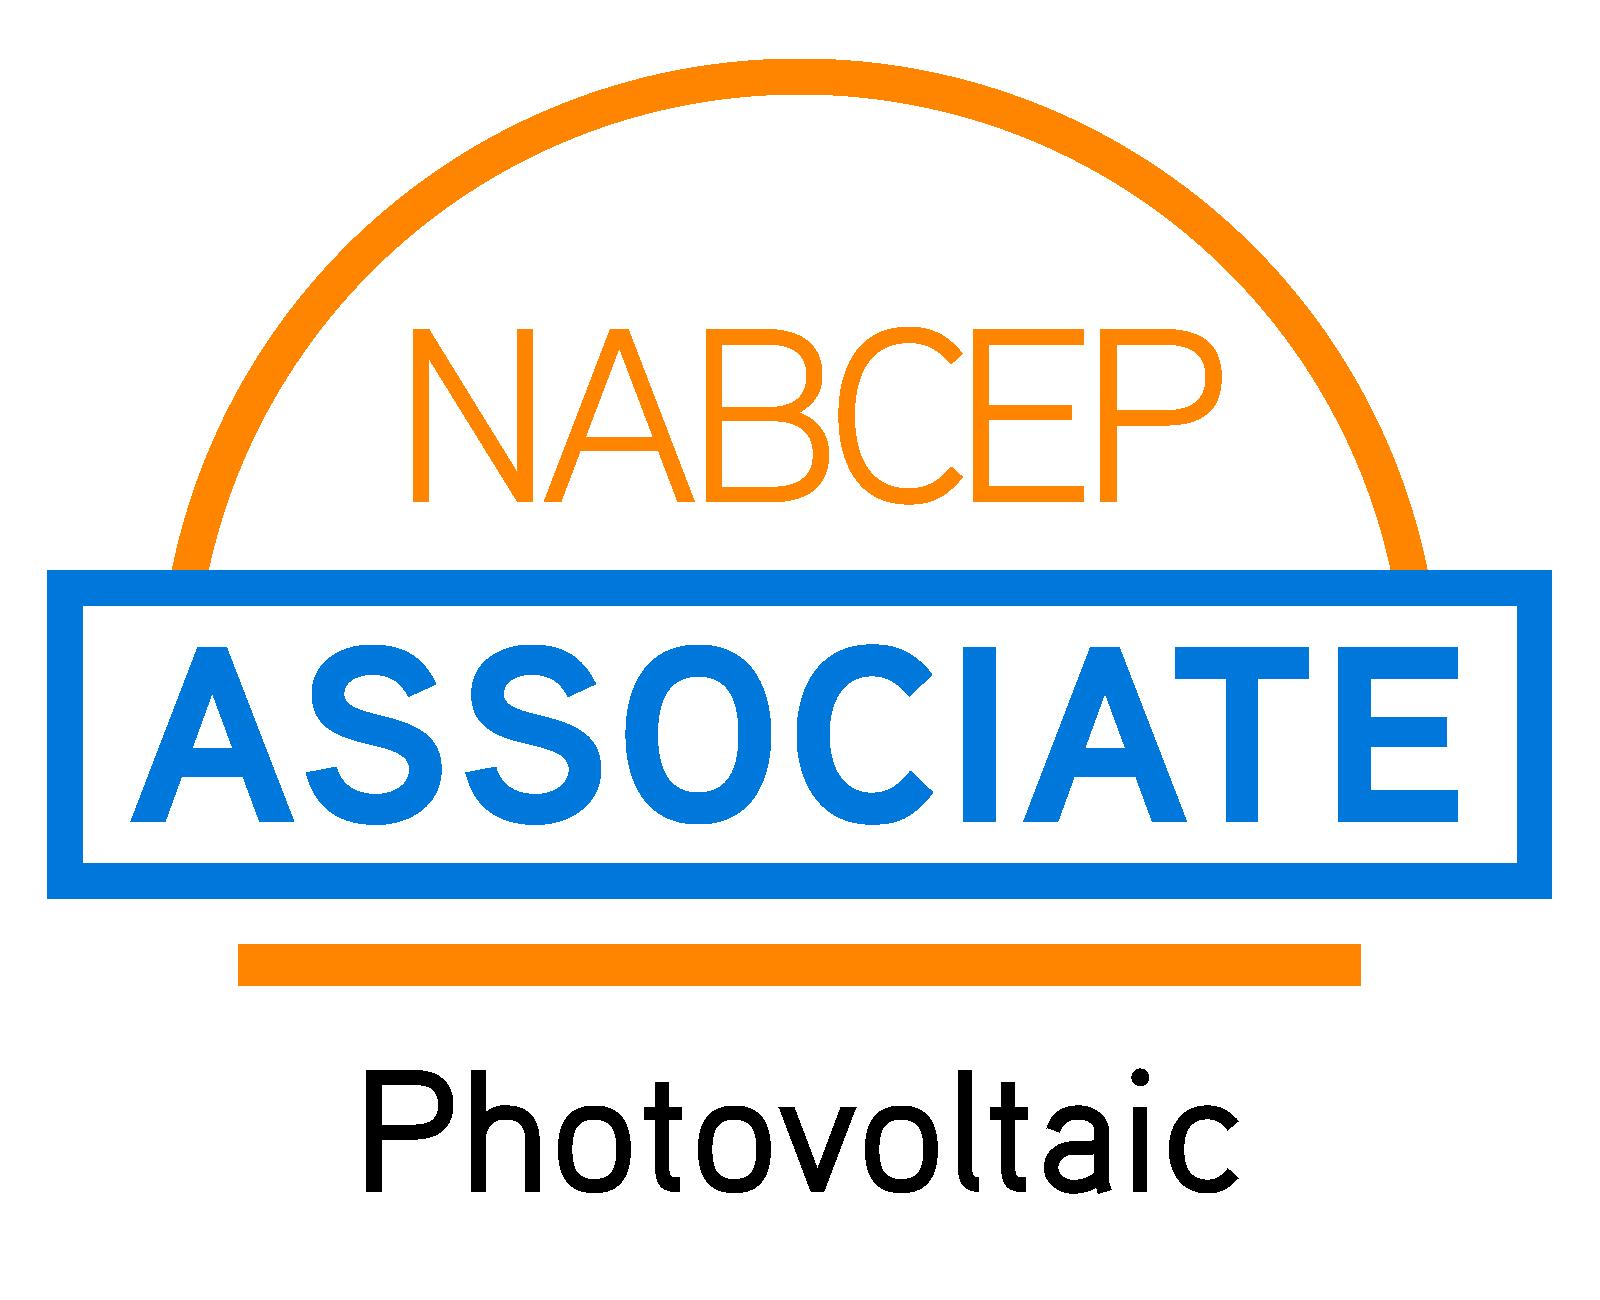 NABCEP Associate mark